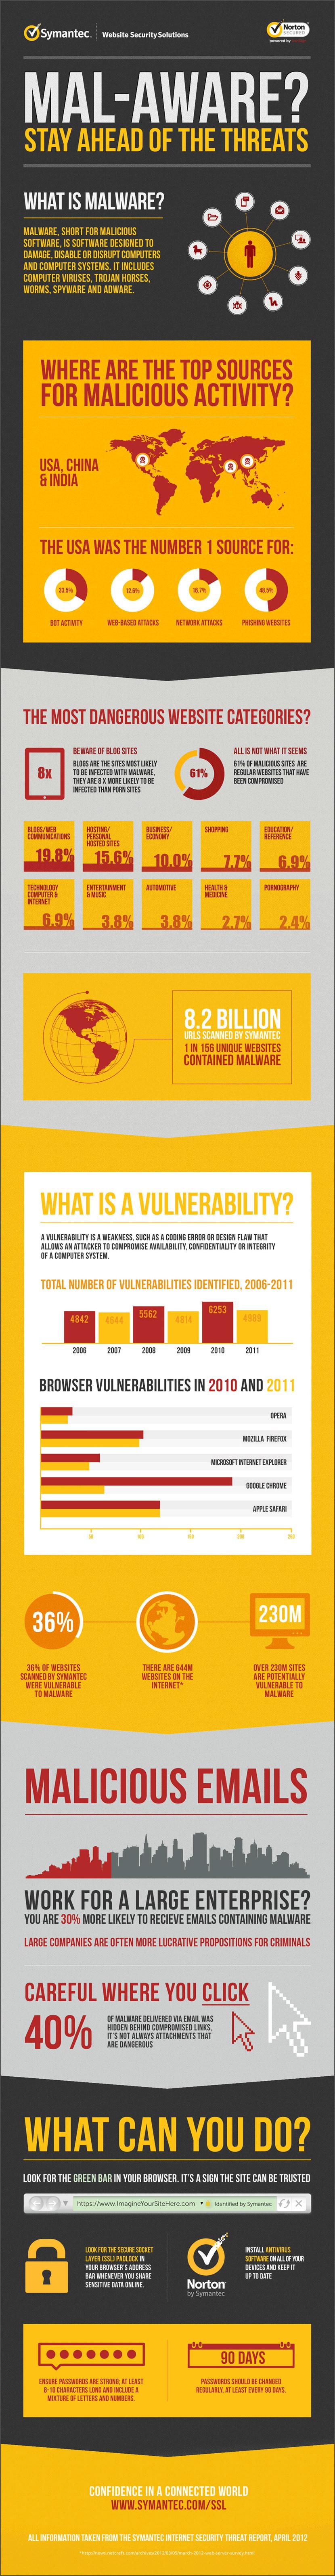 symantec malaware uk antivirus norton infographic